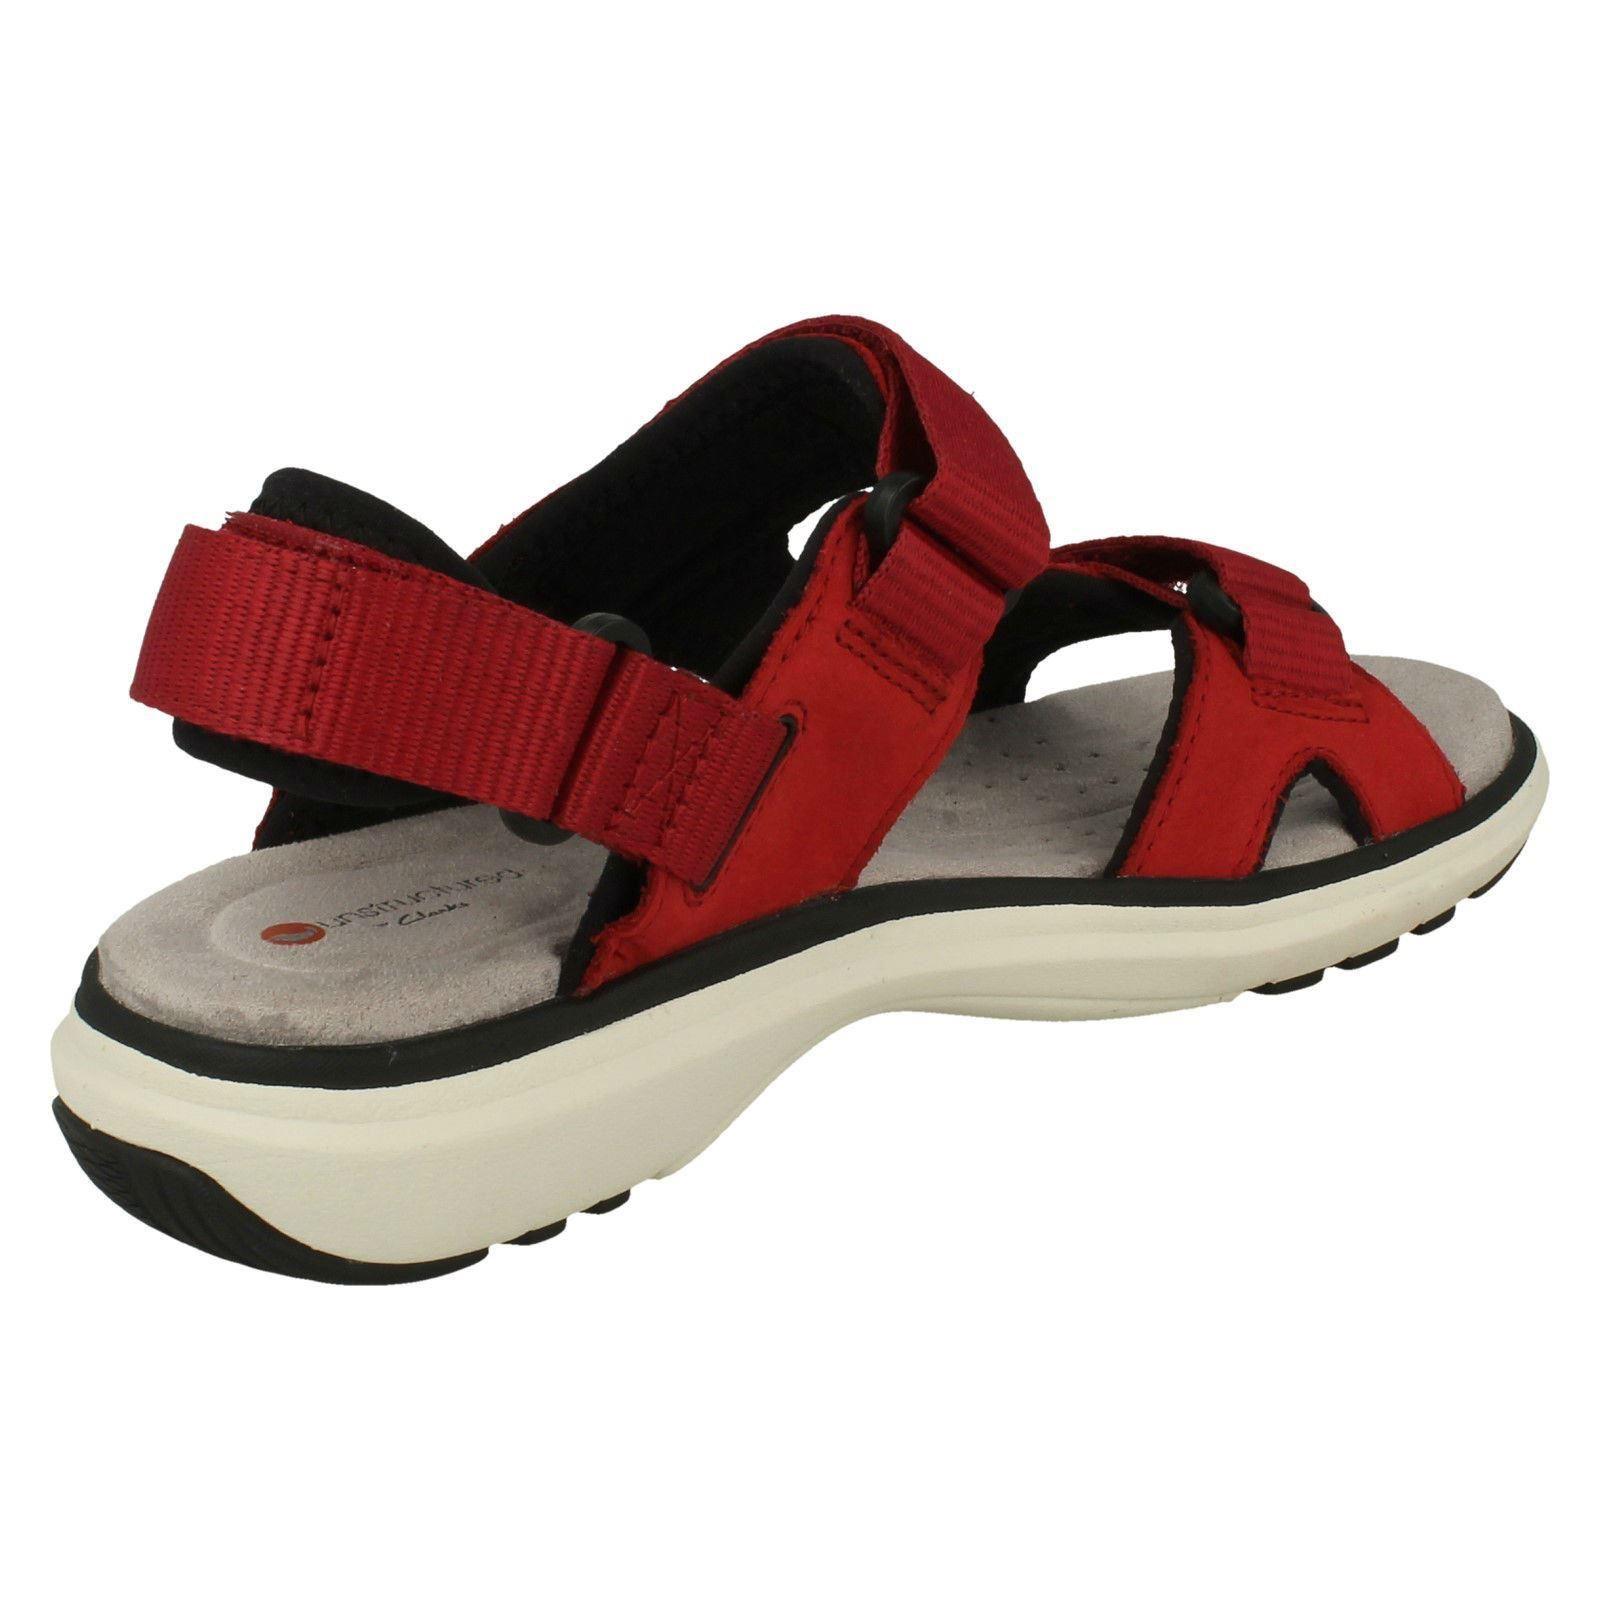 Gentleman/Lady Ladies Clarks Sports Sandals *Un Roam Step* Reputation first Vintage cheapest Vintage first tide shoes RA299 5d20d3